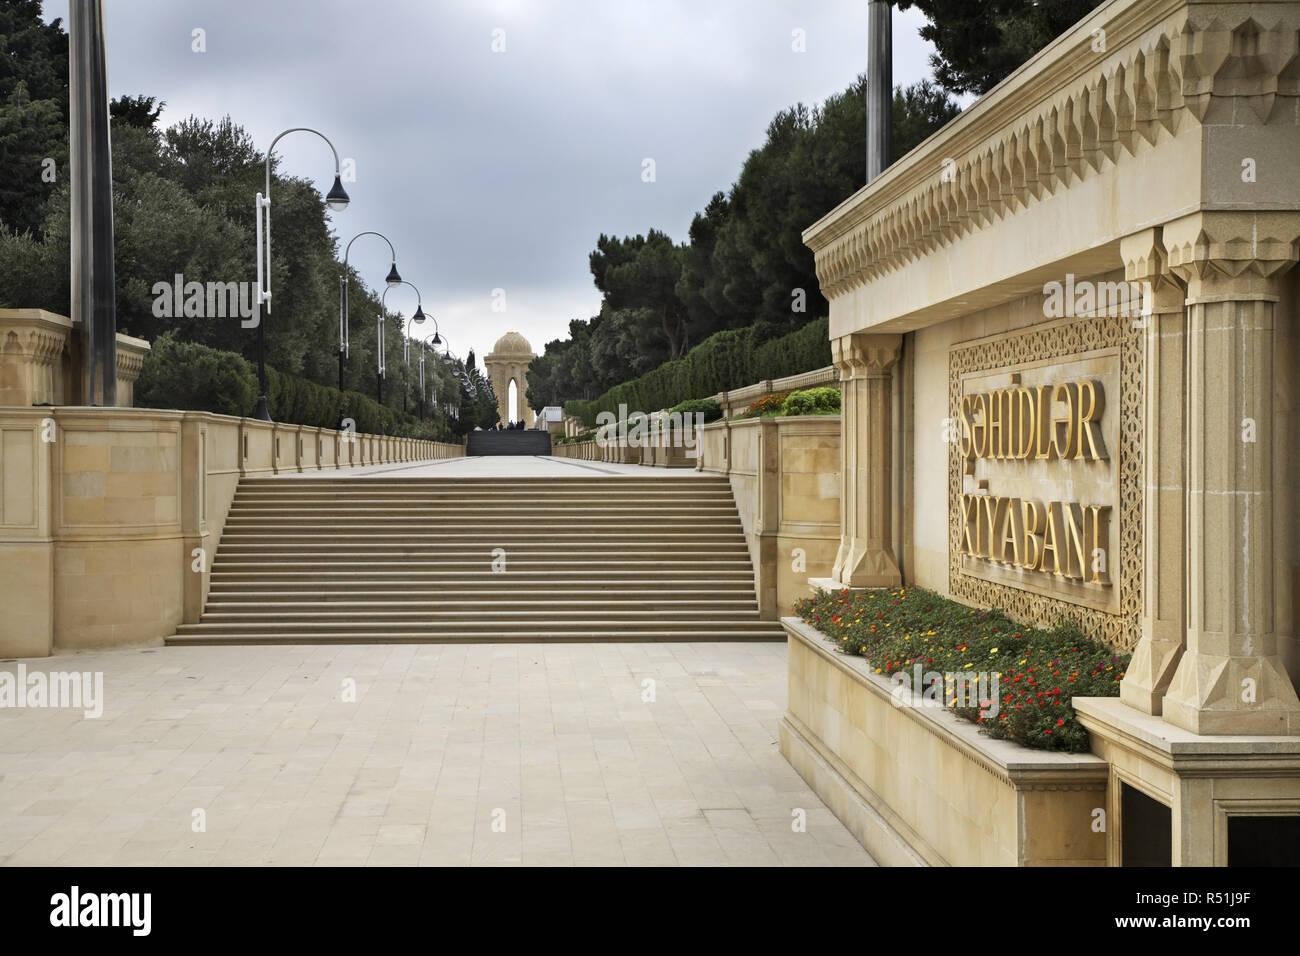 Martyrs' Lane (Alley of Martyrs) in Baku. Azerbaijan Stock Photo